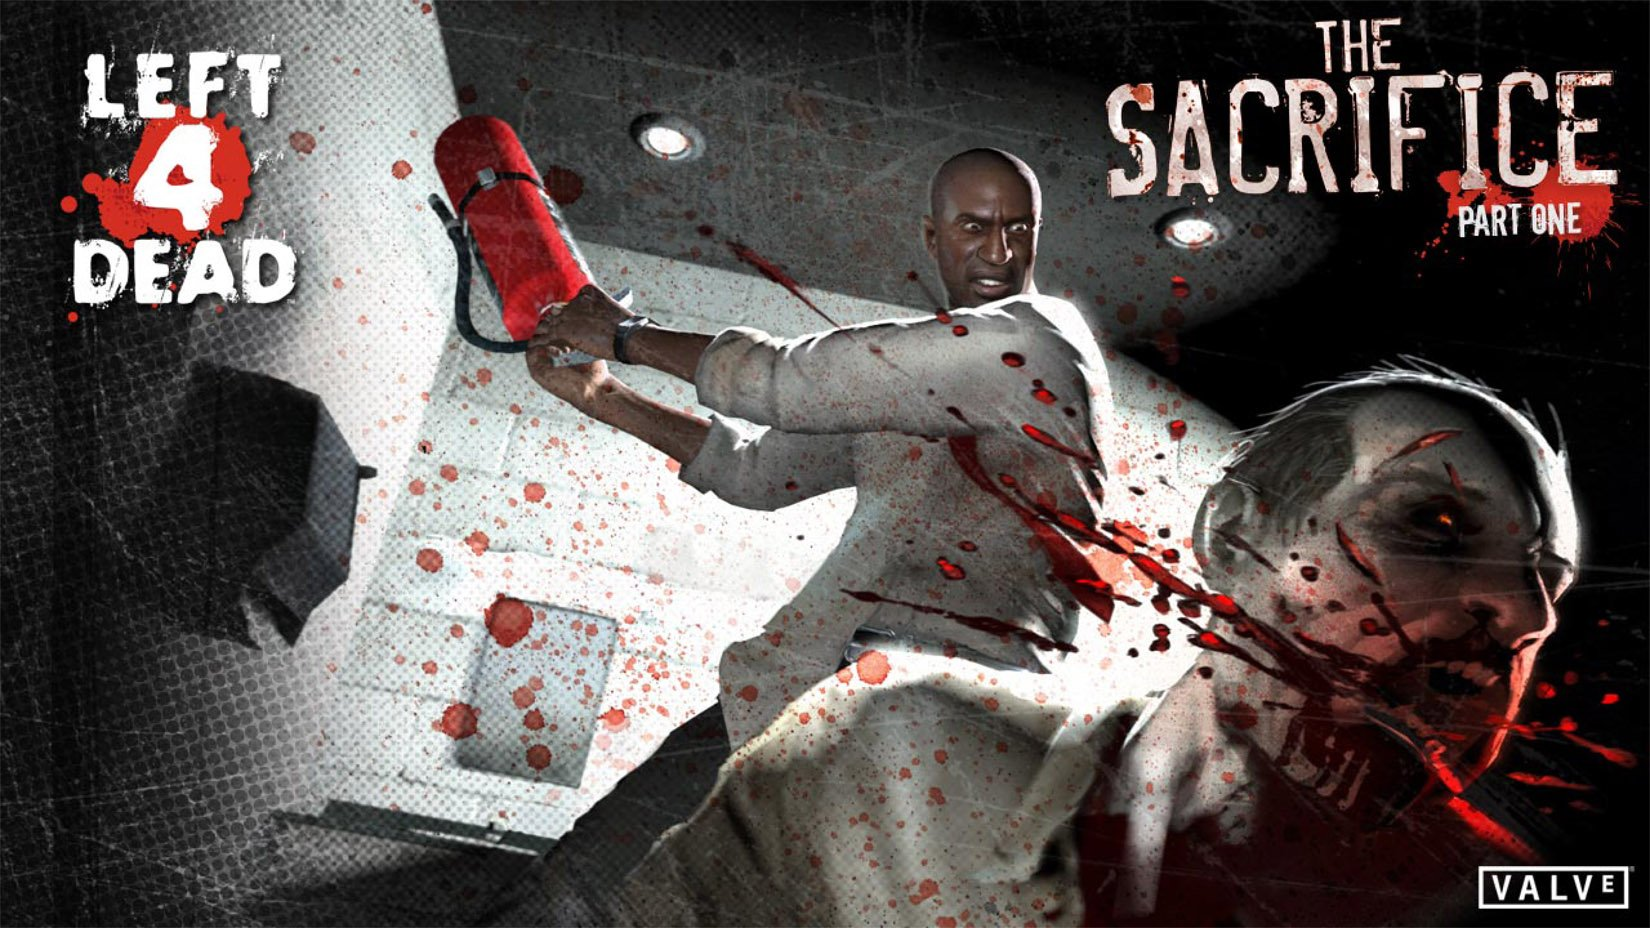 Left 4 Dead: The Sacrifice Issue 01 (2010)